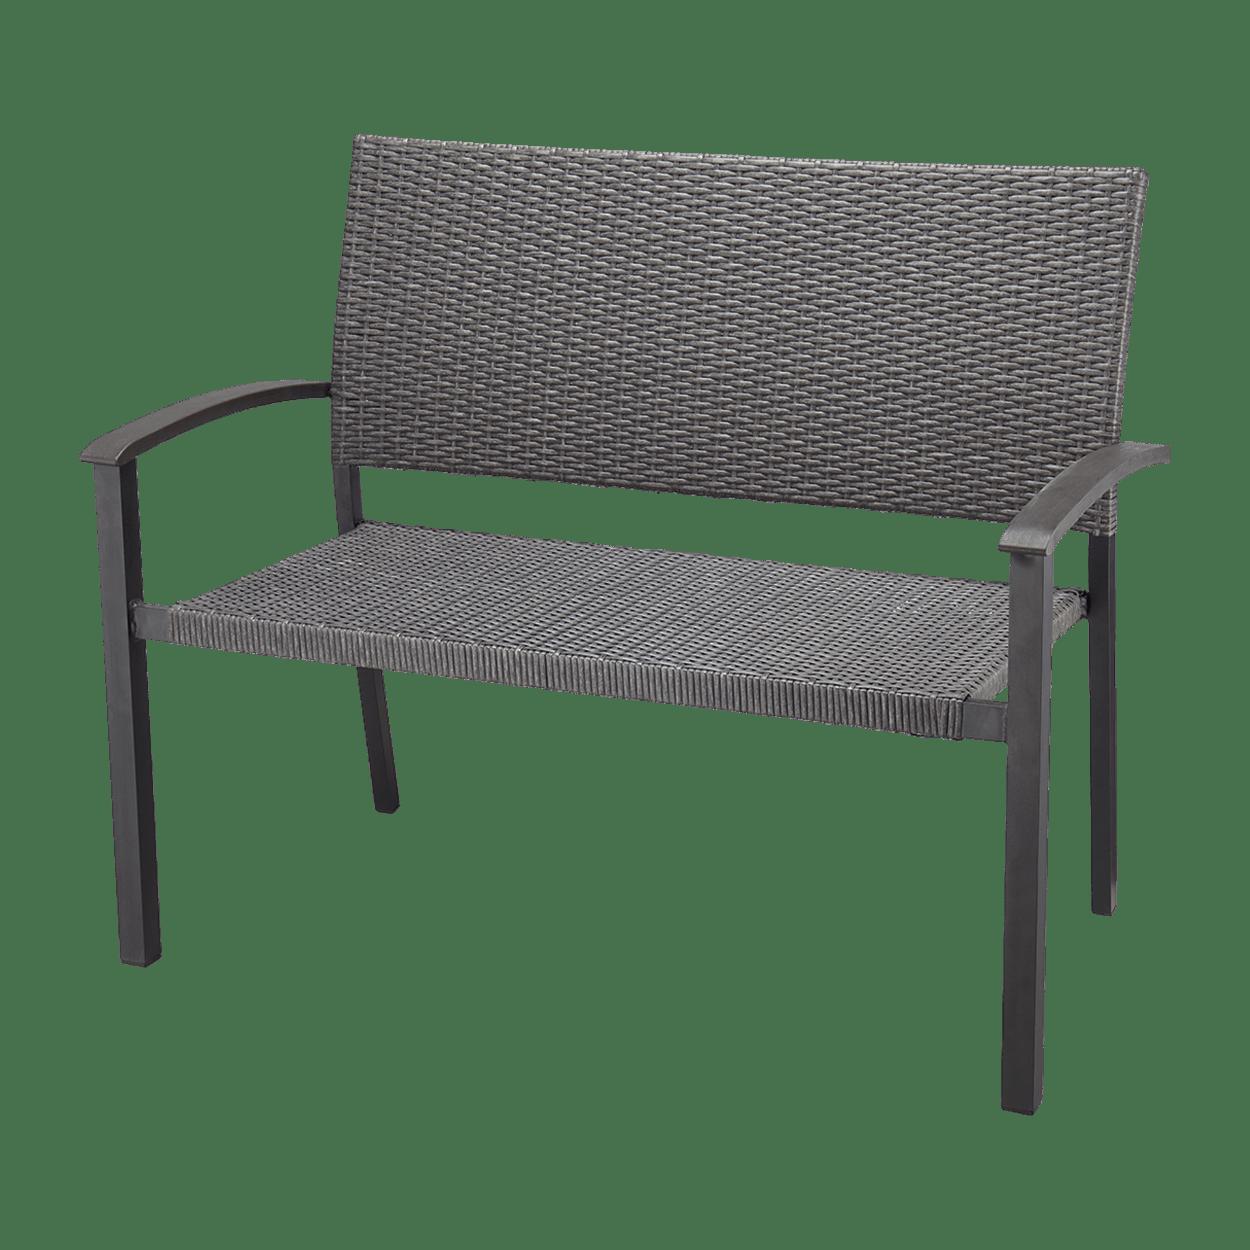 Full Size of Aldi Gartenbank Klappbar 2020 Geflecht 2017 Alu 2018 Aluminium 2019 Rattan Gnstig Bei Nord Relaxsessel Garten Wohnzimmer Aldi Gartenbank